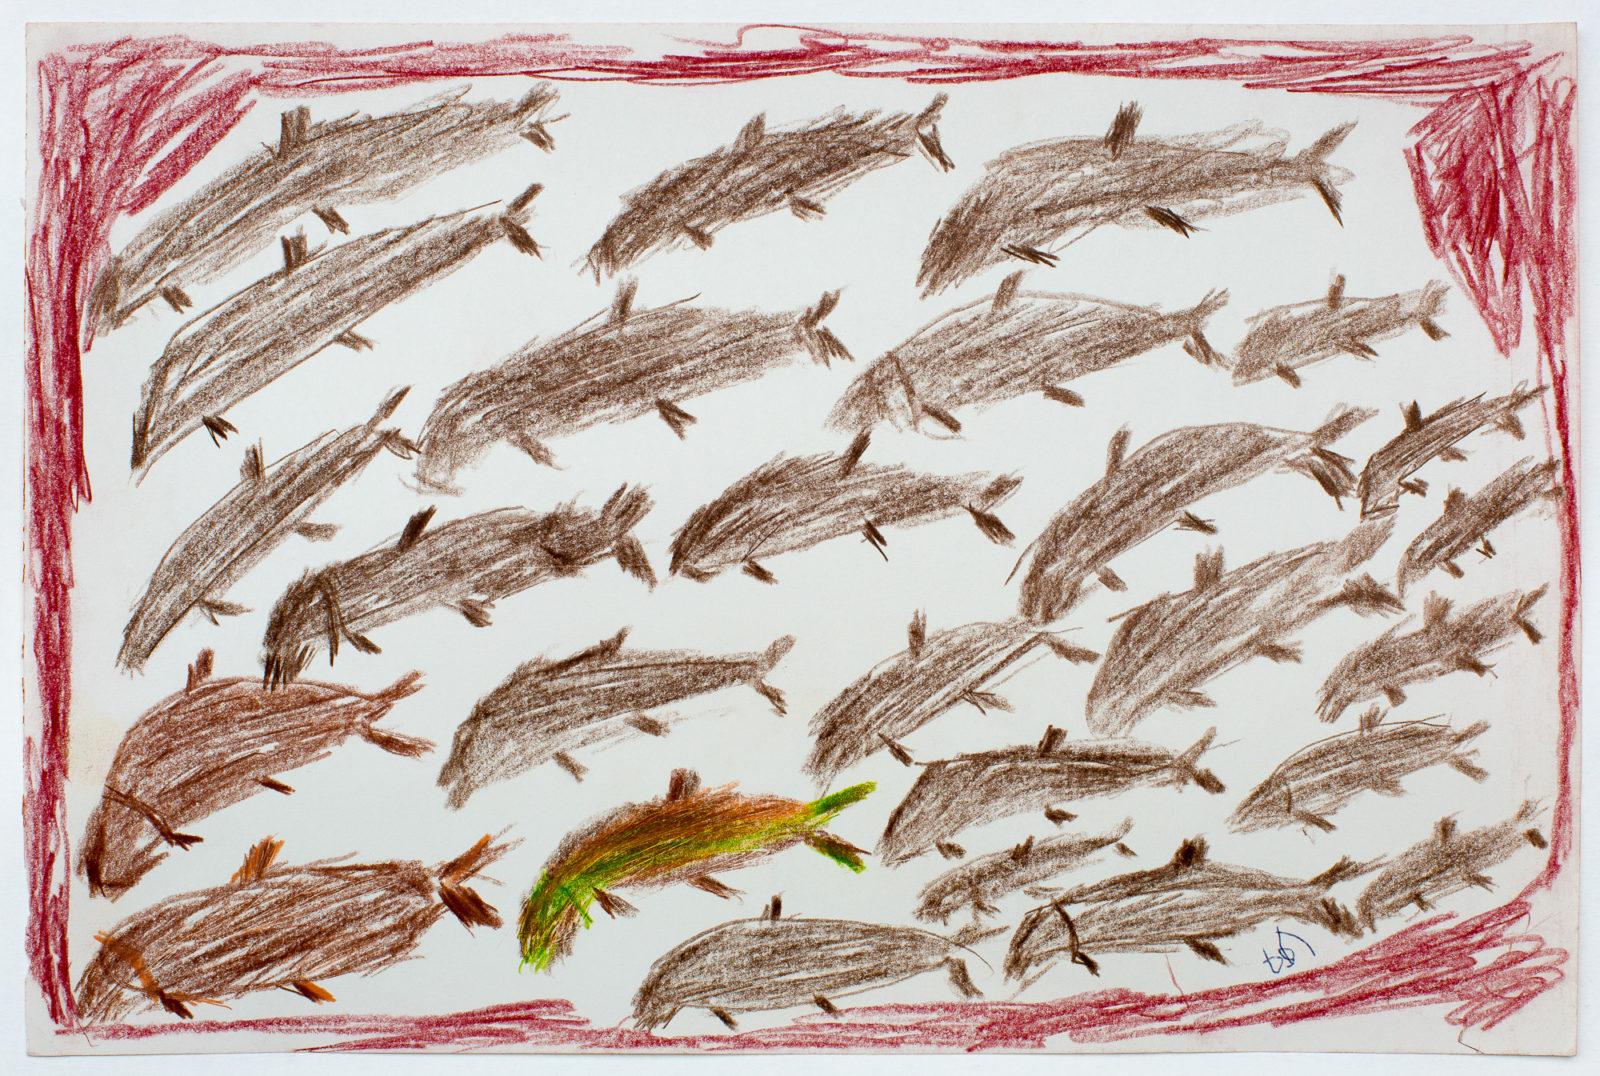 John Kavik - untitled (many fish)